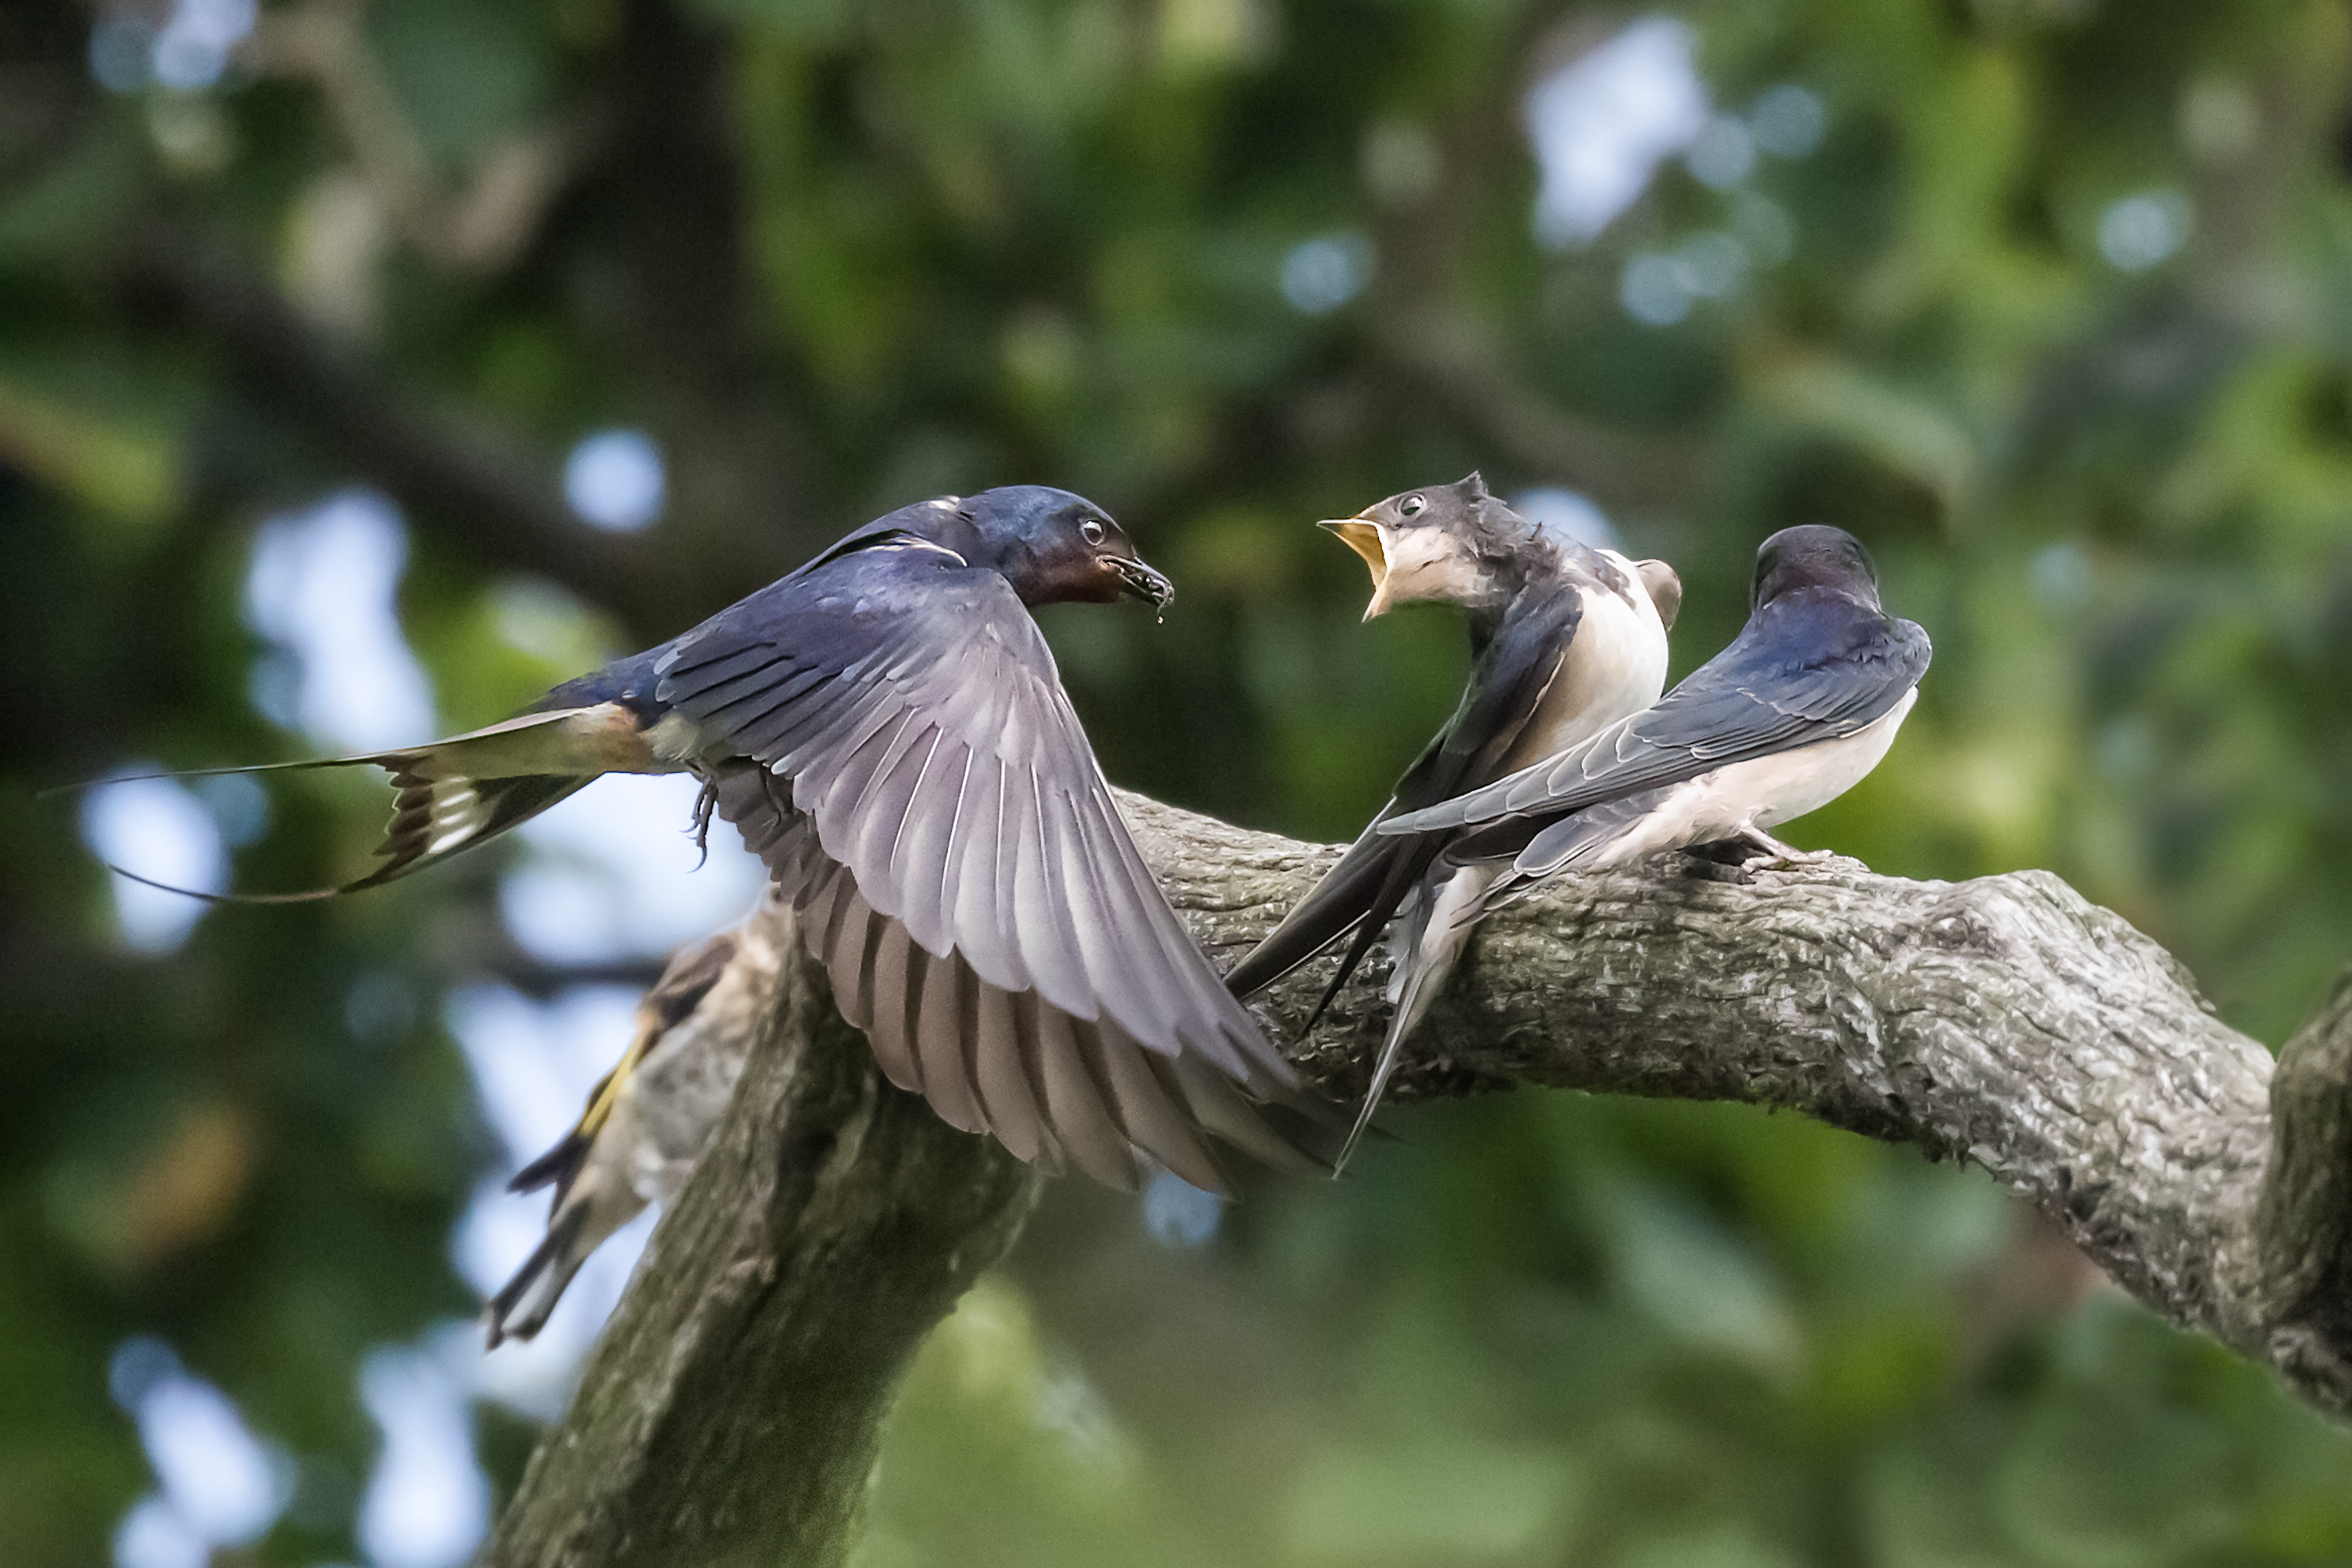 Feeding time #1